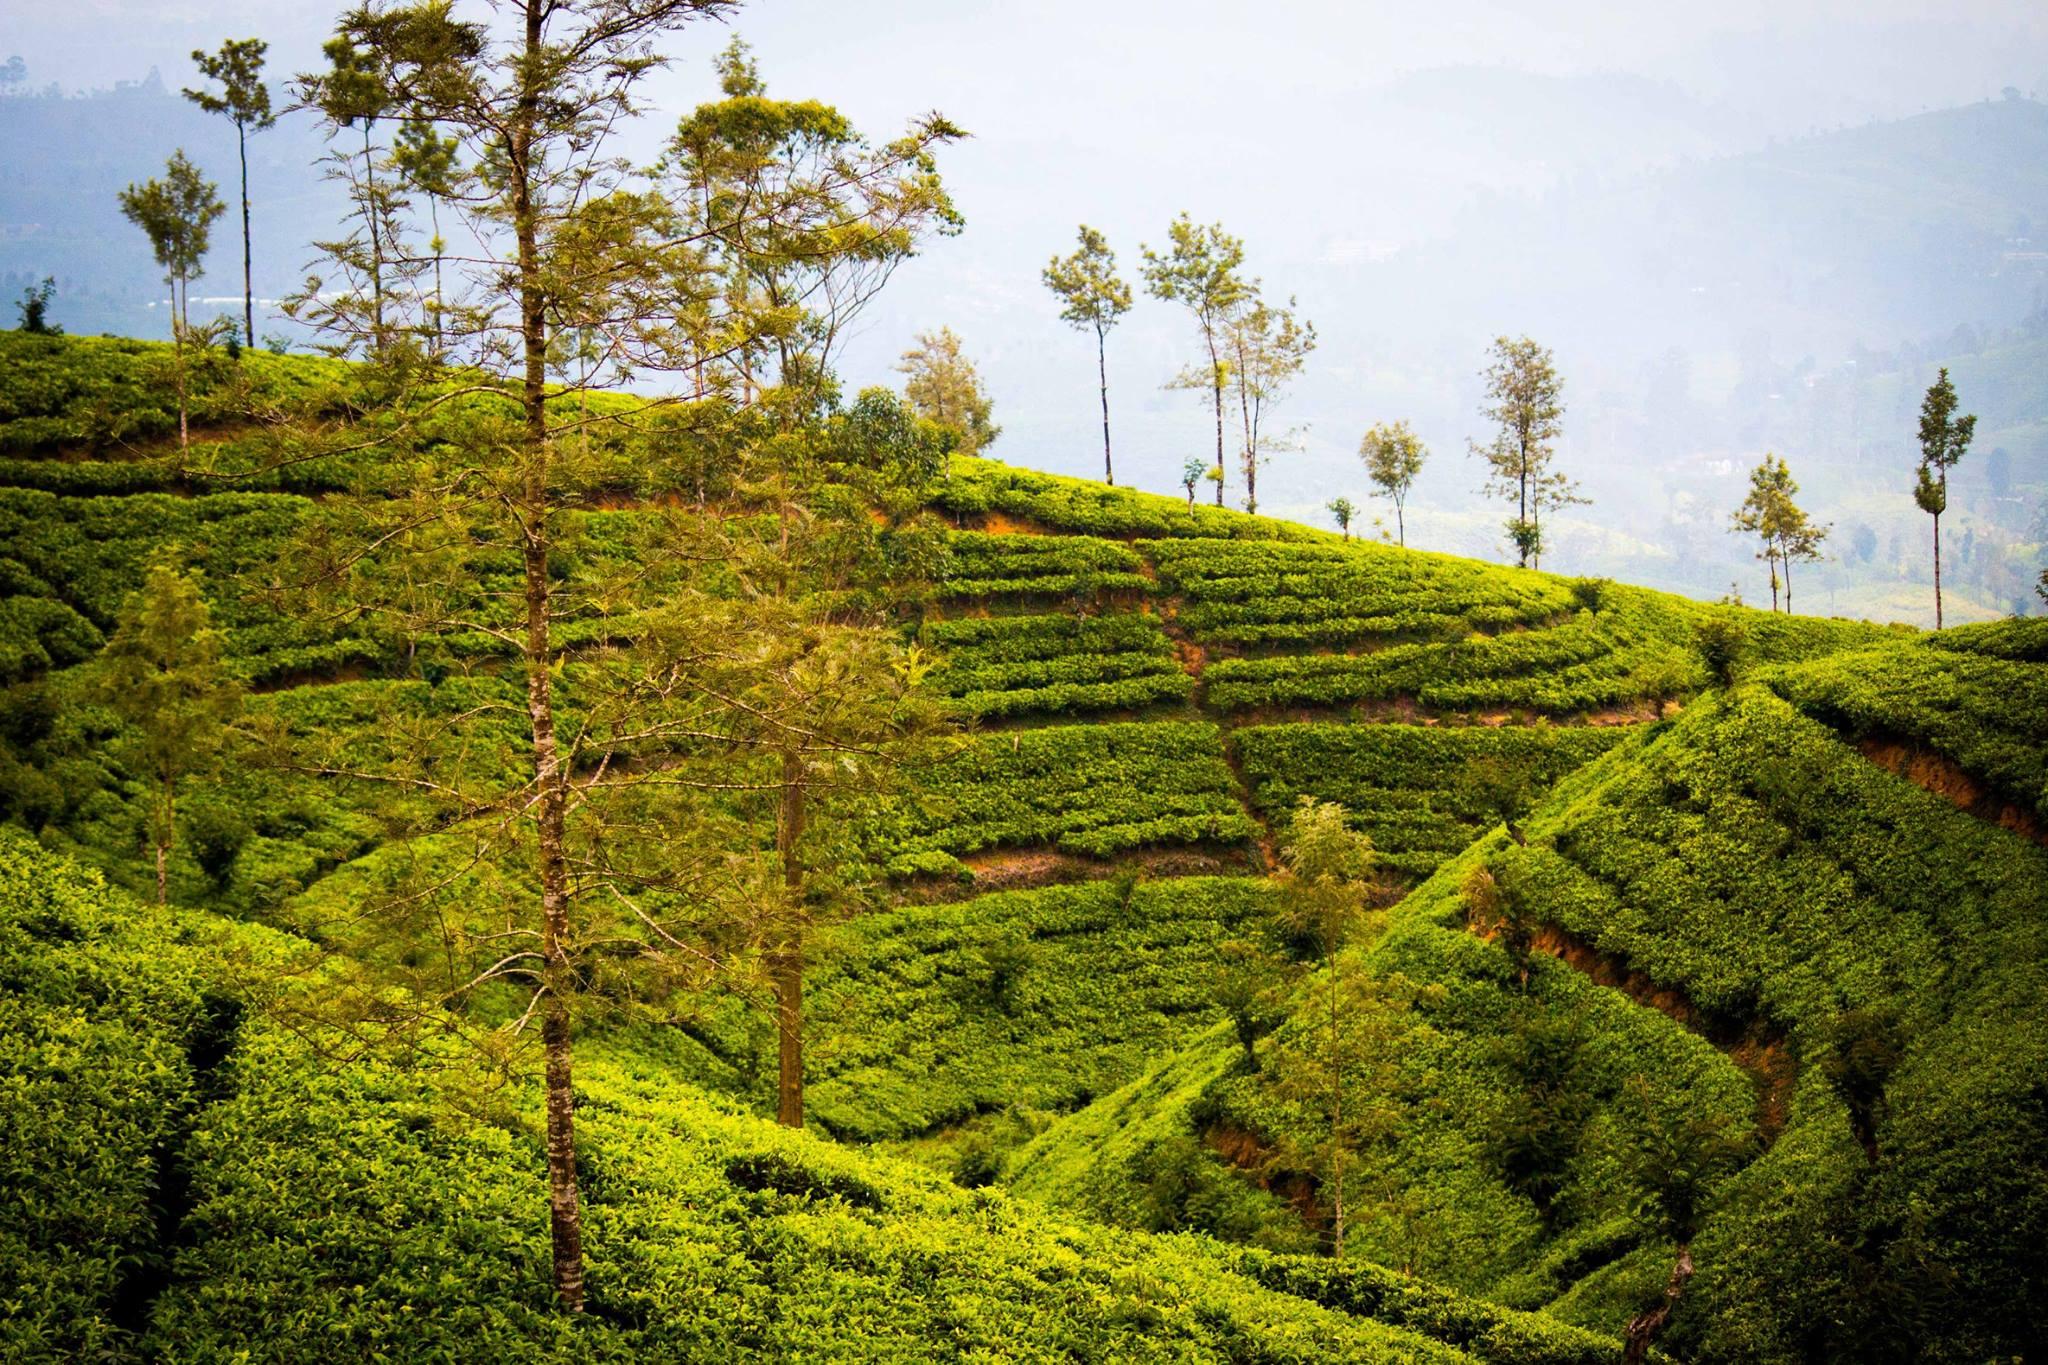 invite-to-paradise-sri-lanka-and-maldives-specialists-travel-agent-tour-operator-customer-review--feedback-joel-rhian-tea-plantation-3.jpg